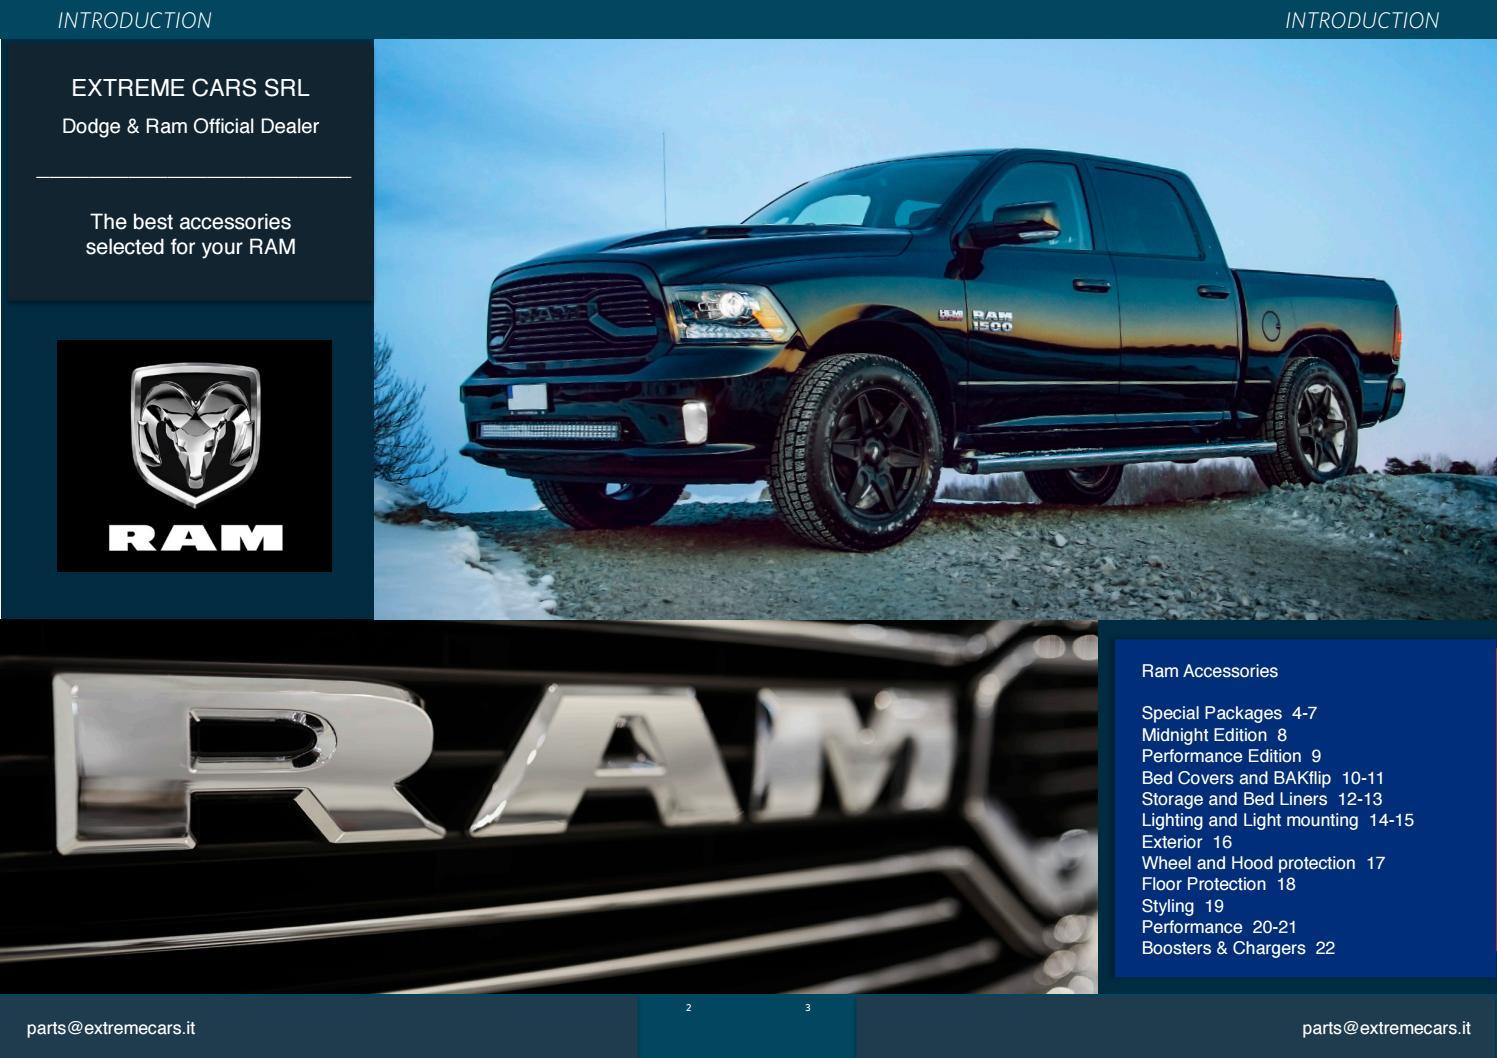 2009 2018 Dodge Ram 1500 Catalogo Accessori K By Extreme Cars Srl Issuu